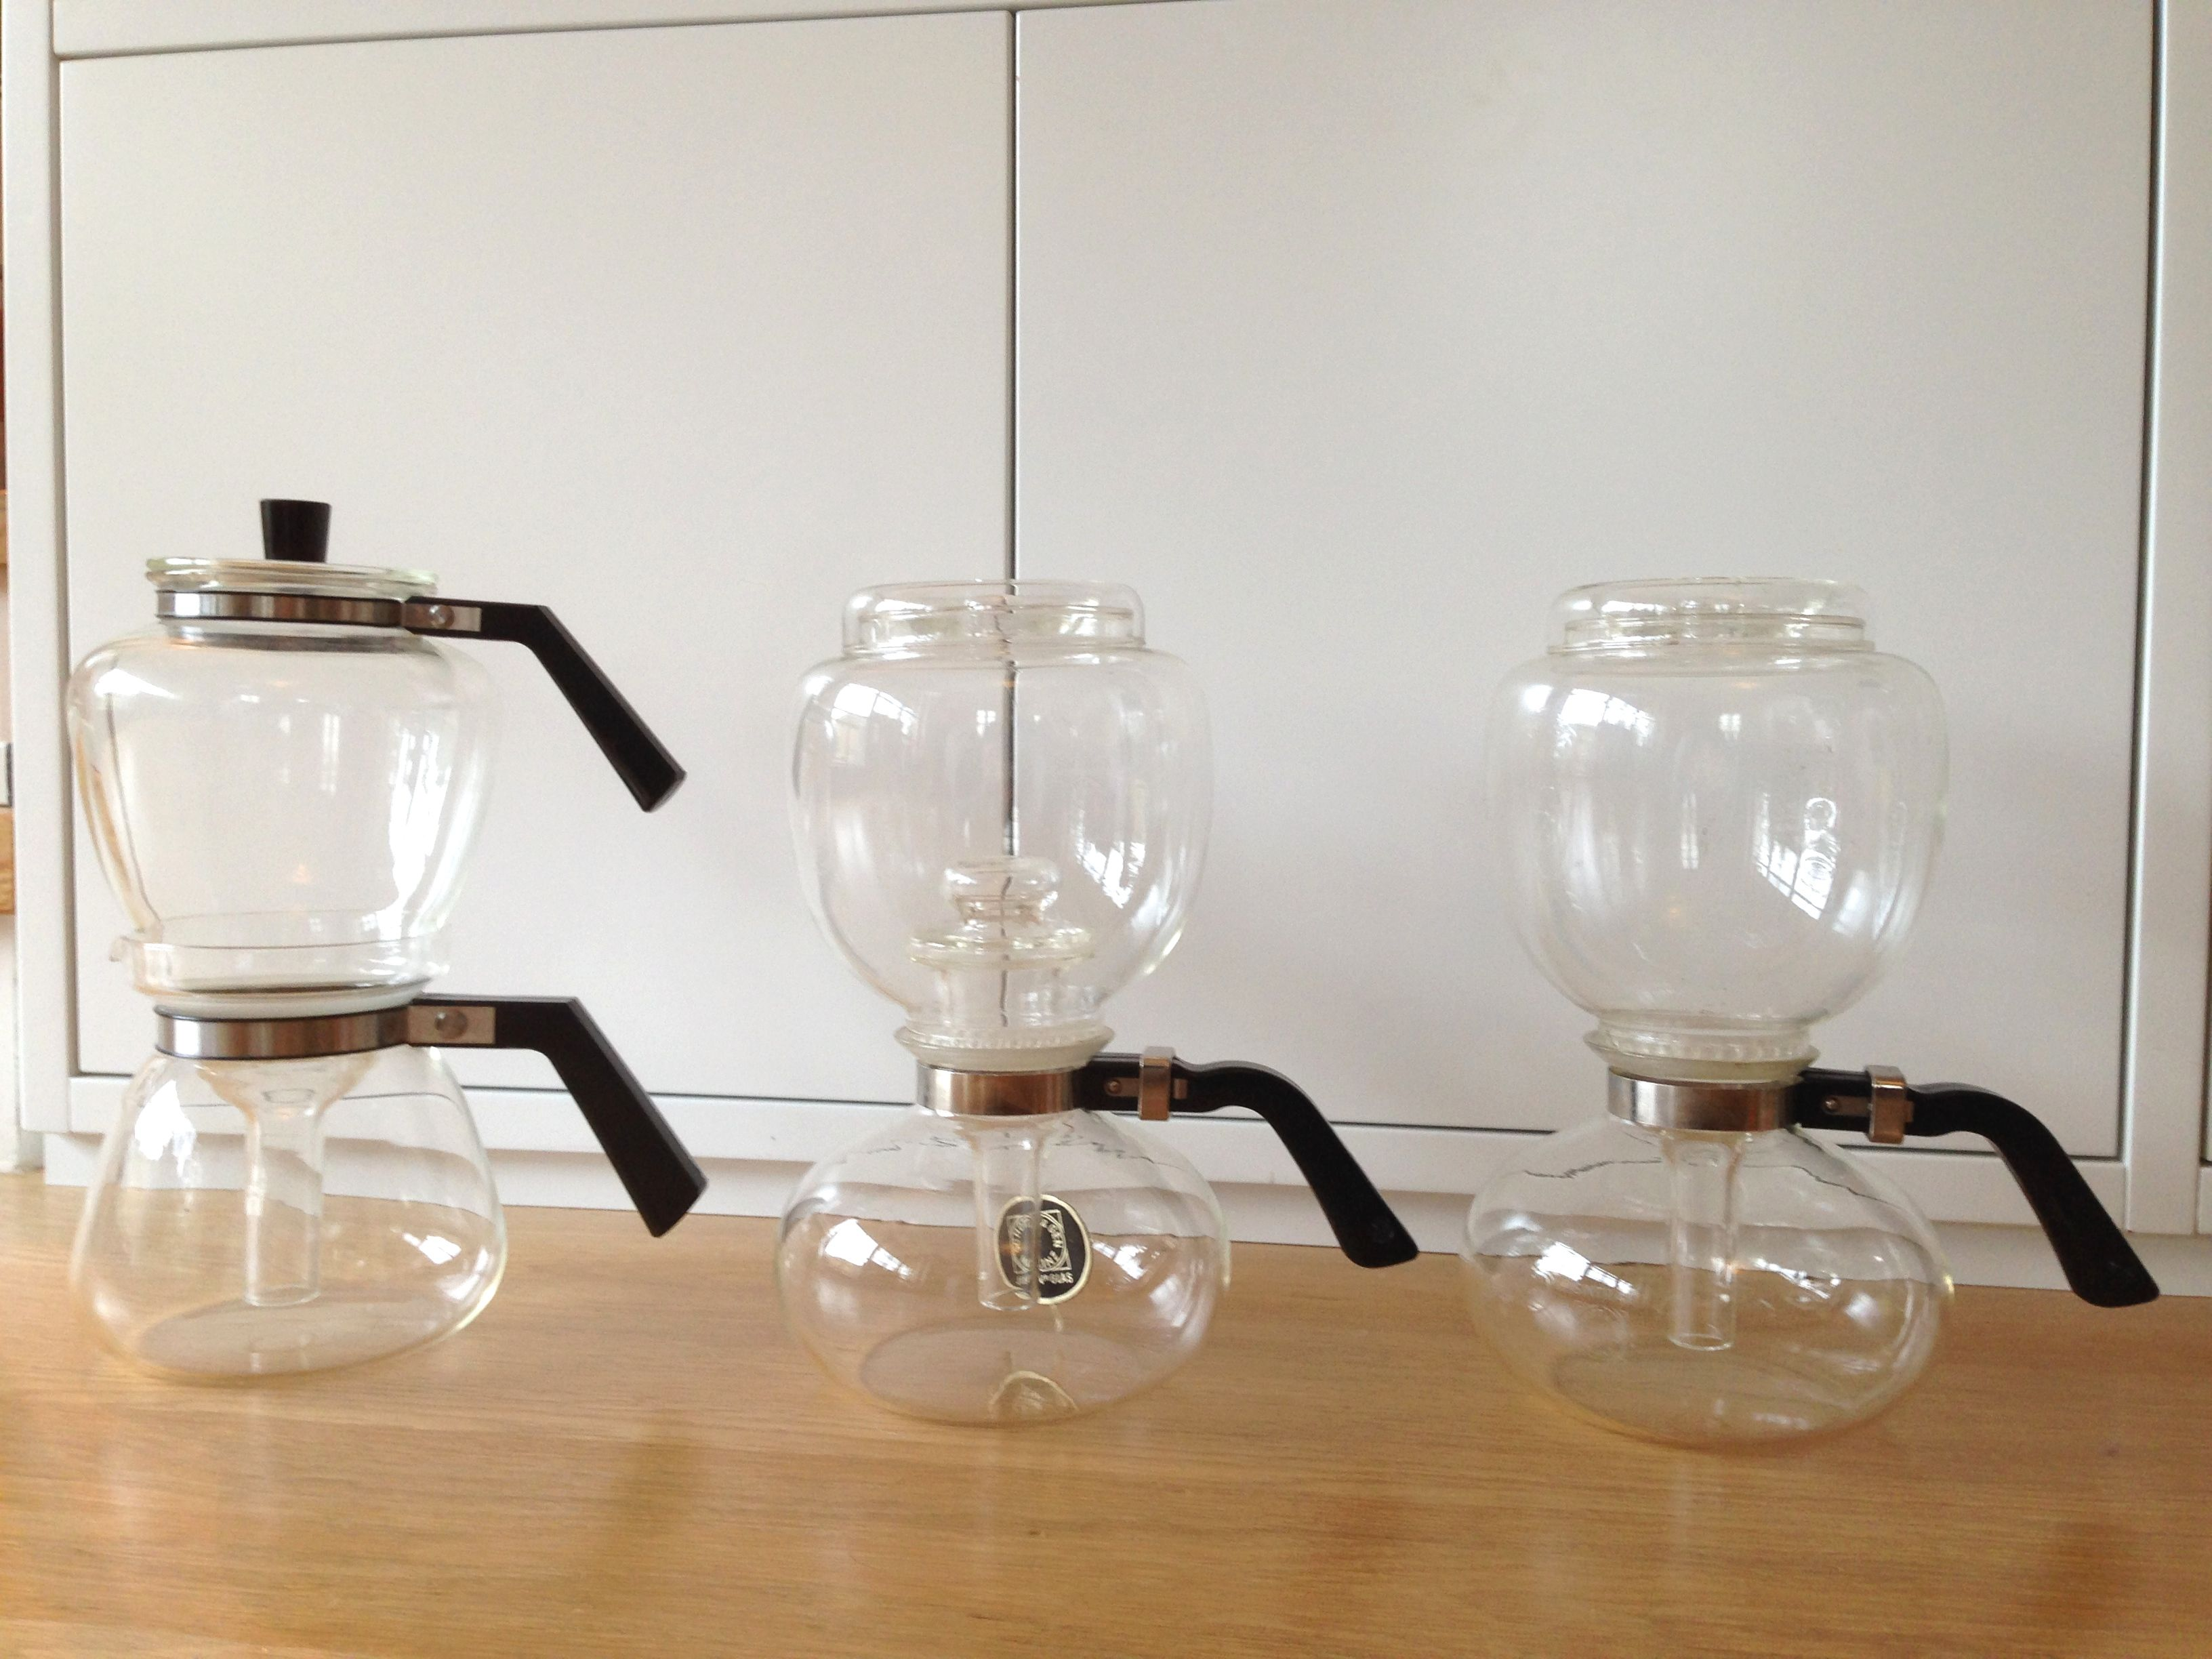 Küchenlounge Wagenfeld ~ Glass coffeemakers vacuum principle first by heinrich